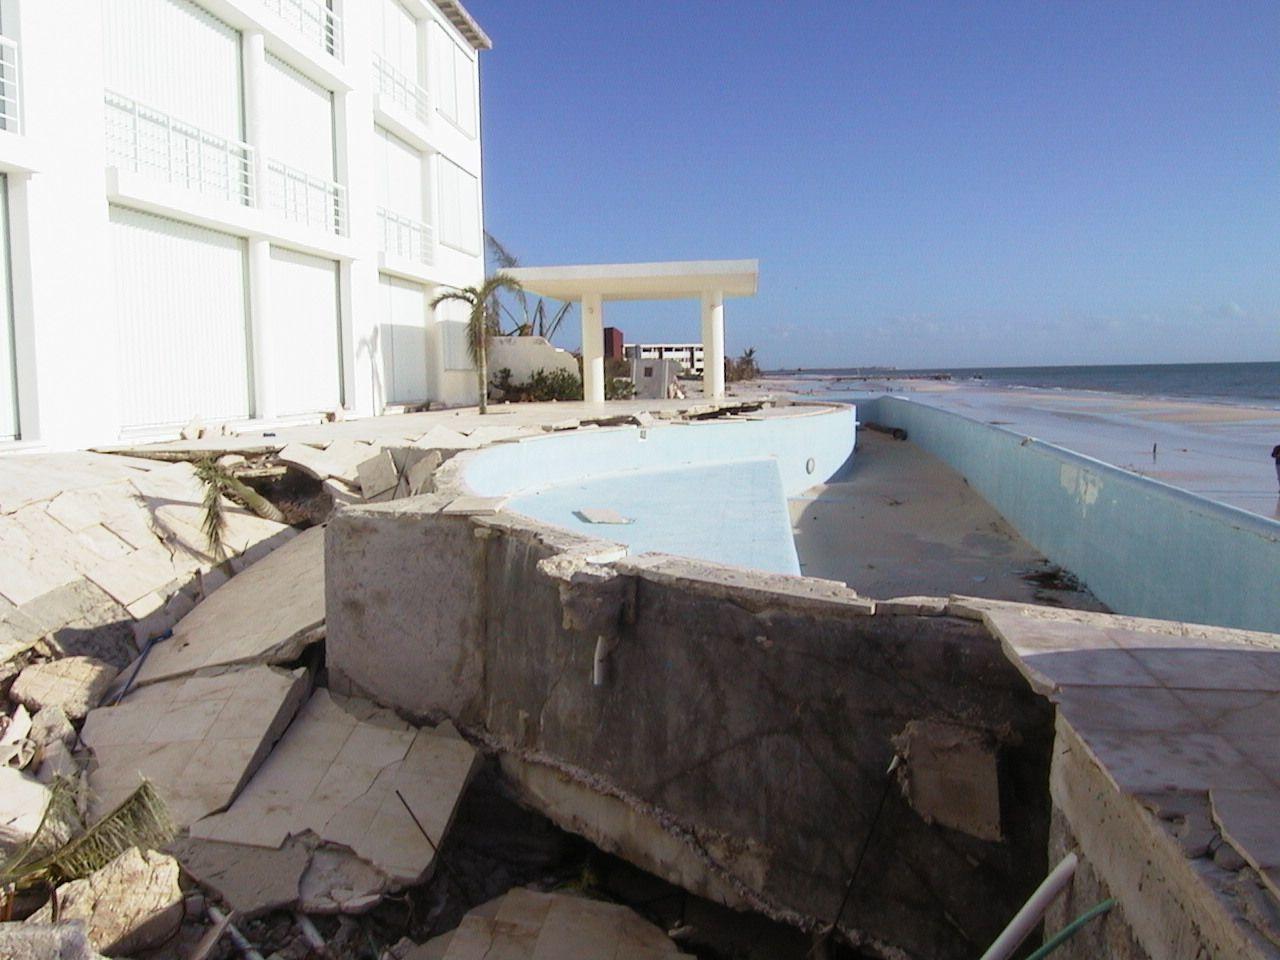 Hurricaine Wilma Aug 2005 Puerto Morelos Yucatan Photos Wilma Made Several Landfalls With The Most Destr Hurricane Wilma Riviera Maya Resorts Puerto Morelos